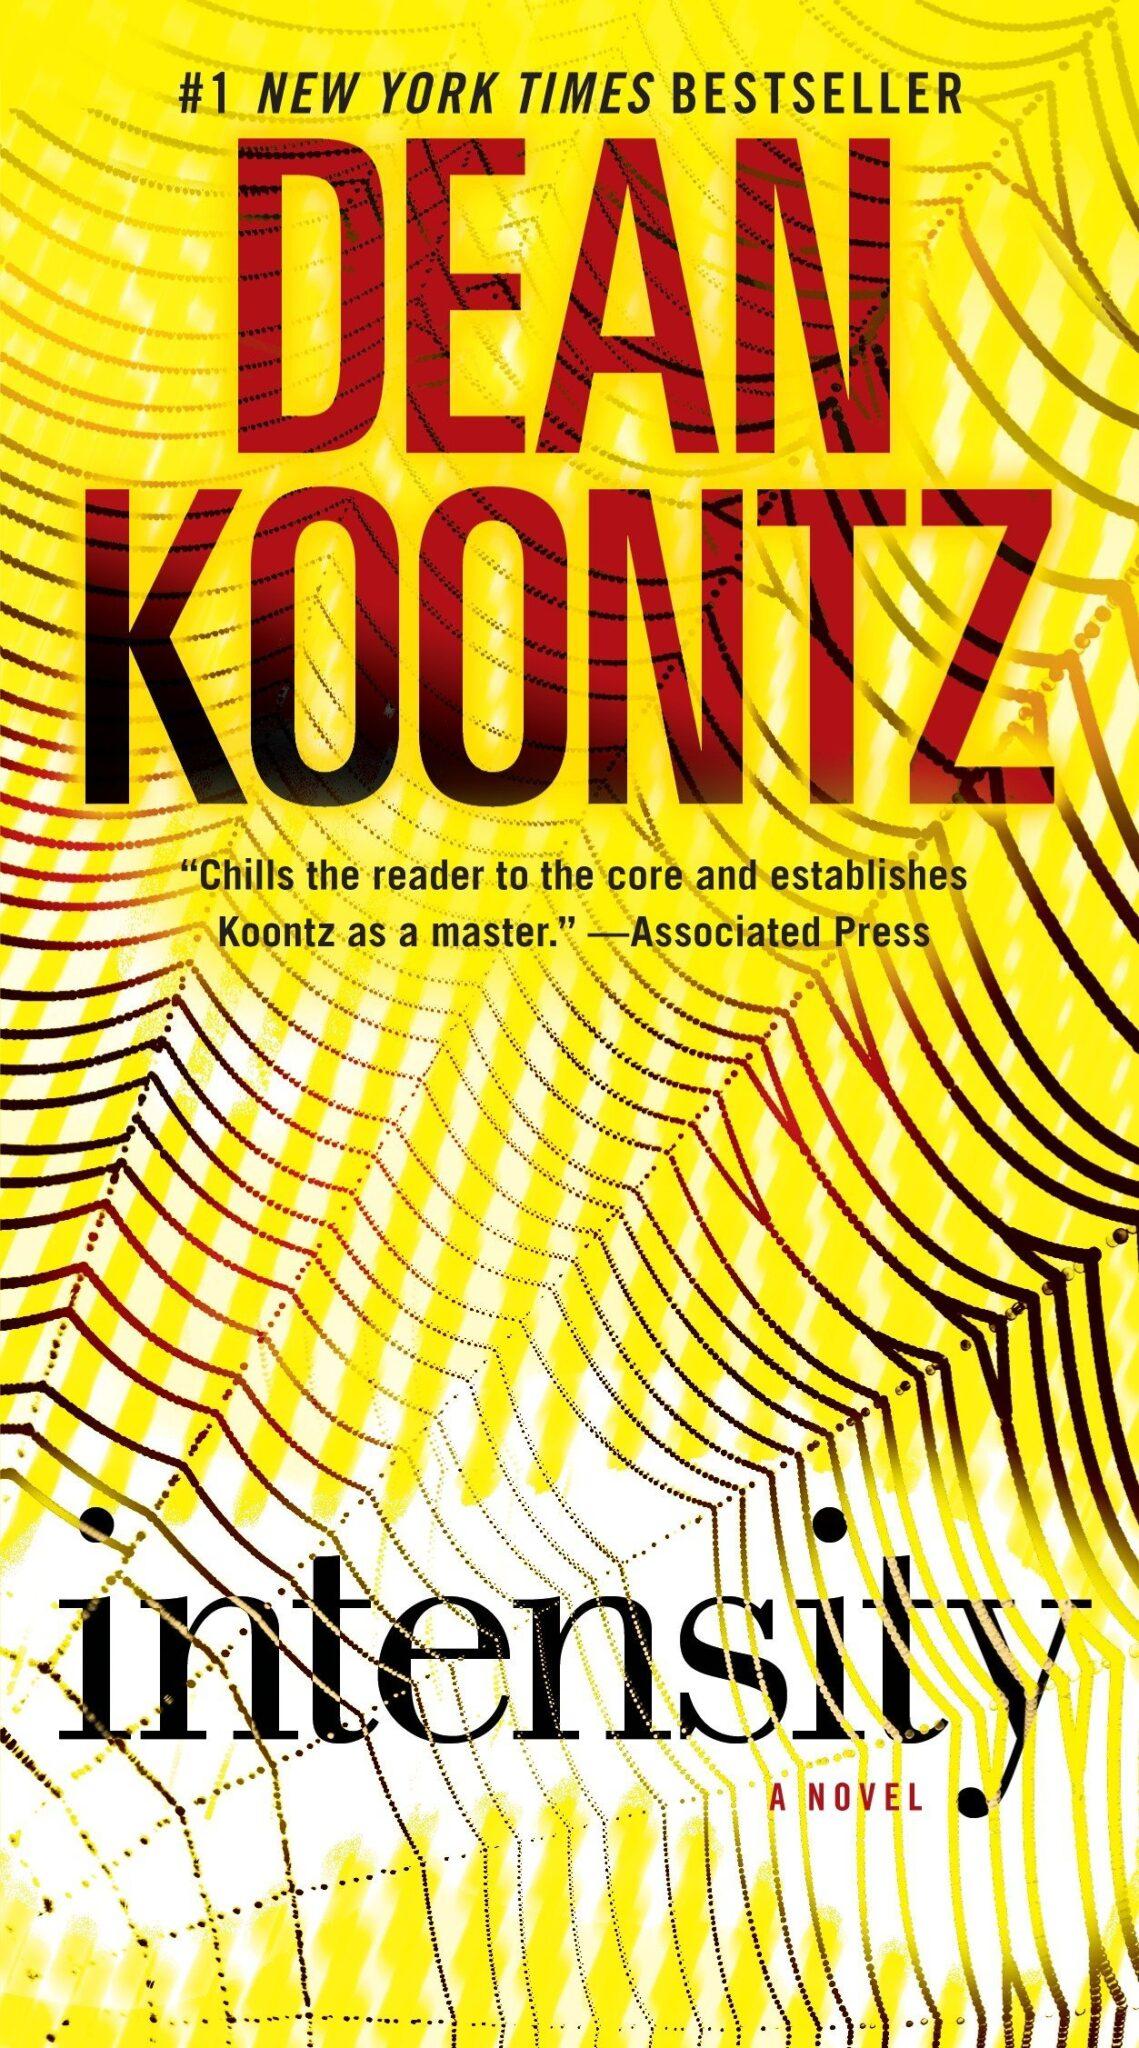 Dean Koontz books 45